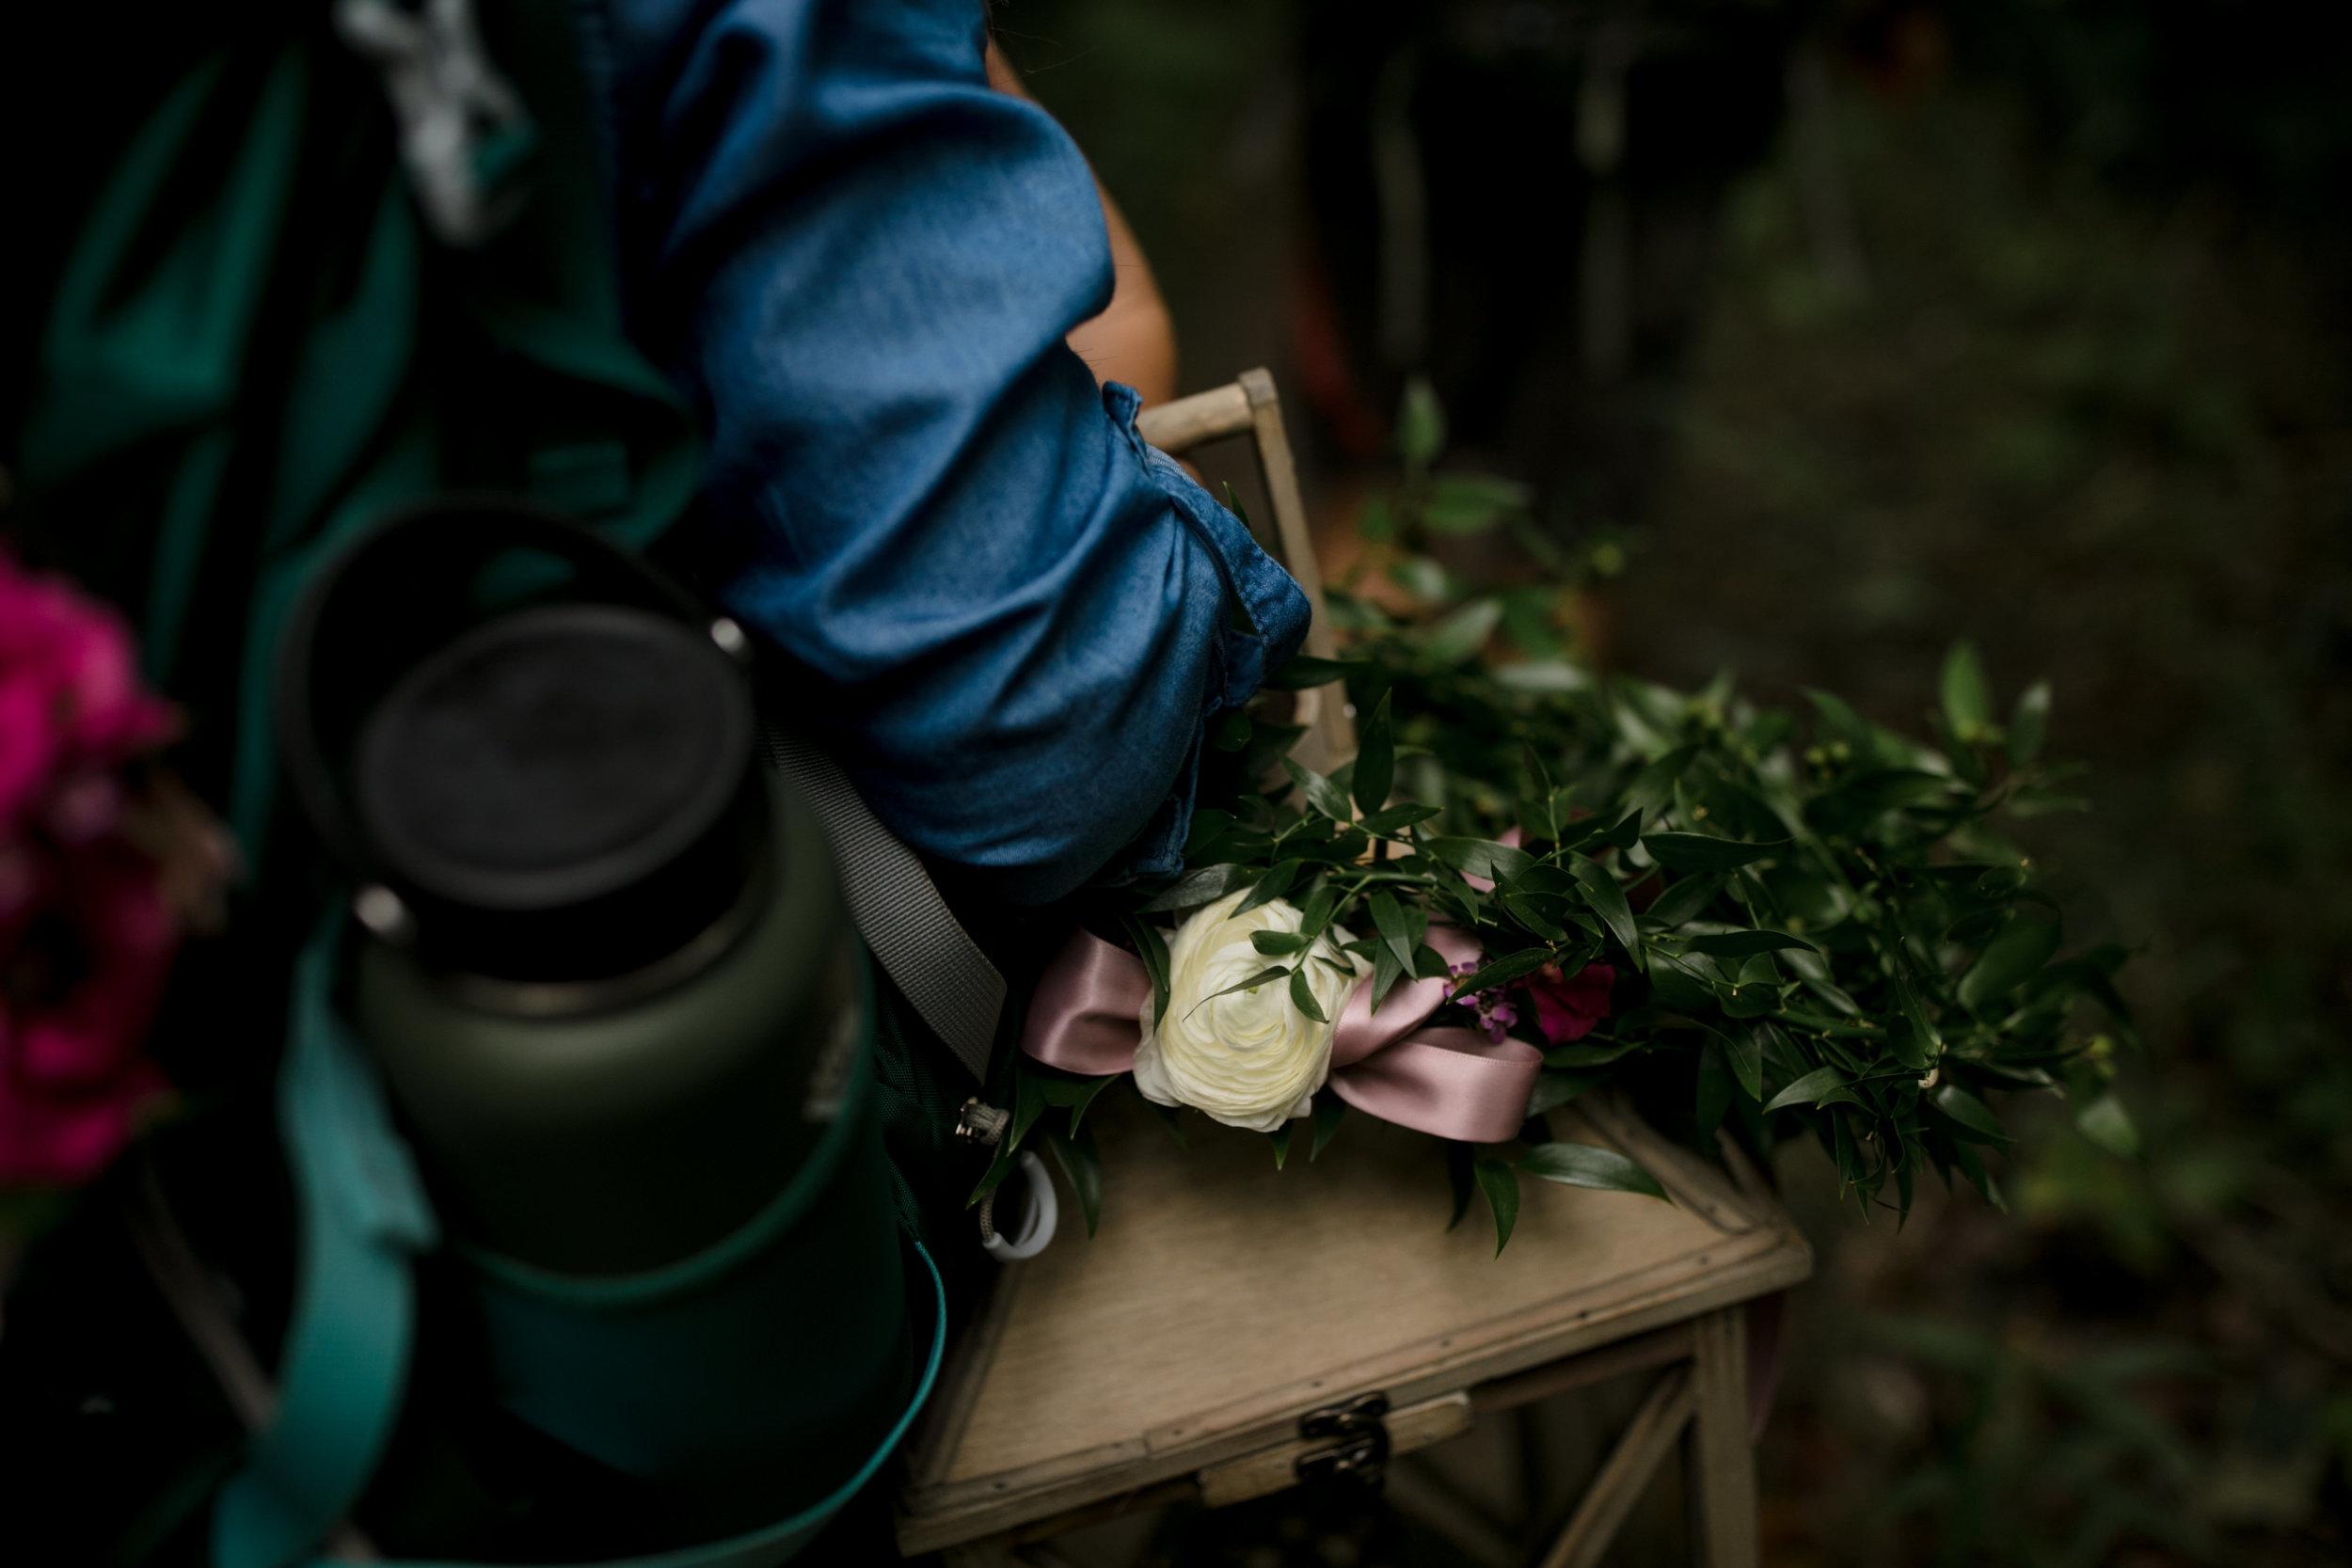 michigan-emotive-photographer-moonlight-elopement-mariha-hunter-17.jpg